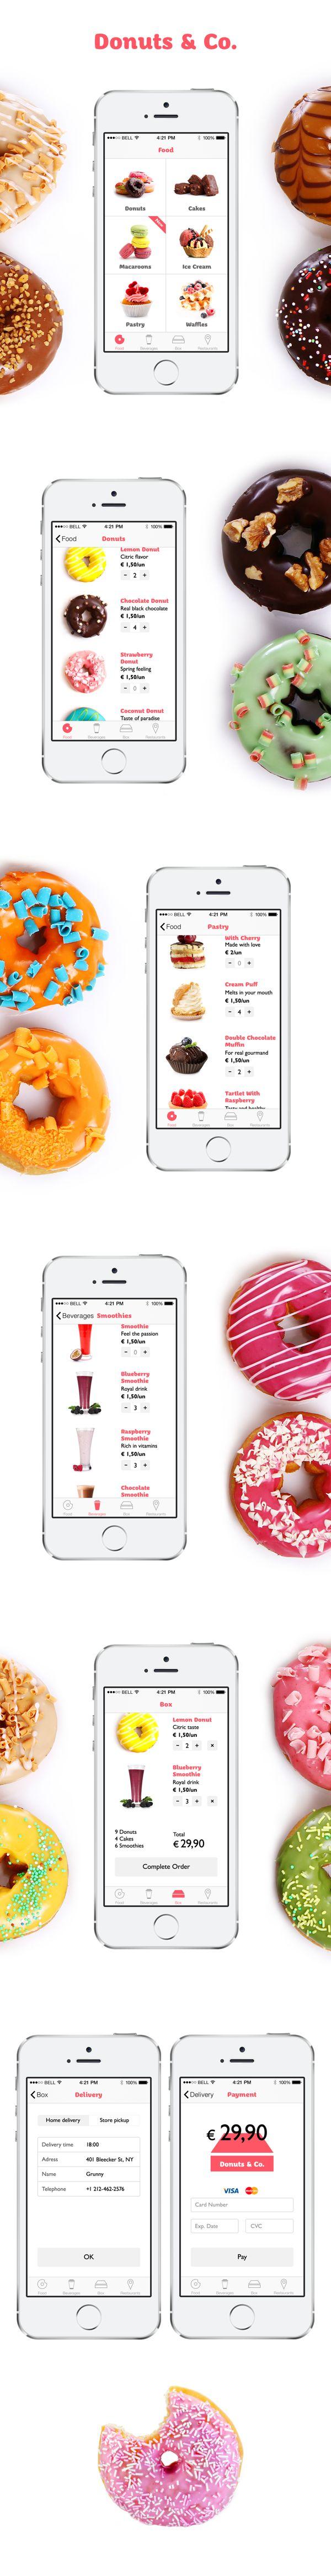 Donuts & Co. App by Ulyana Kravets, via Behance